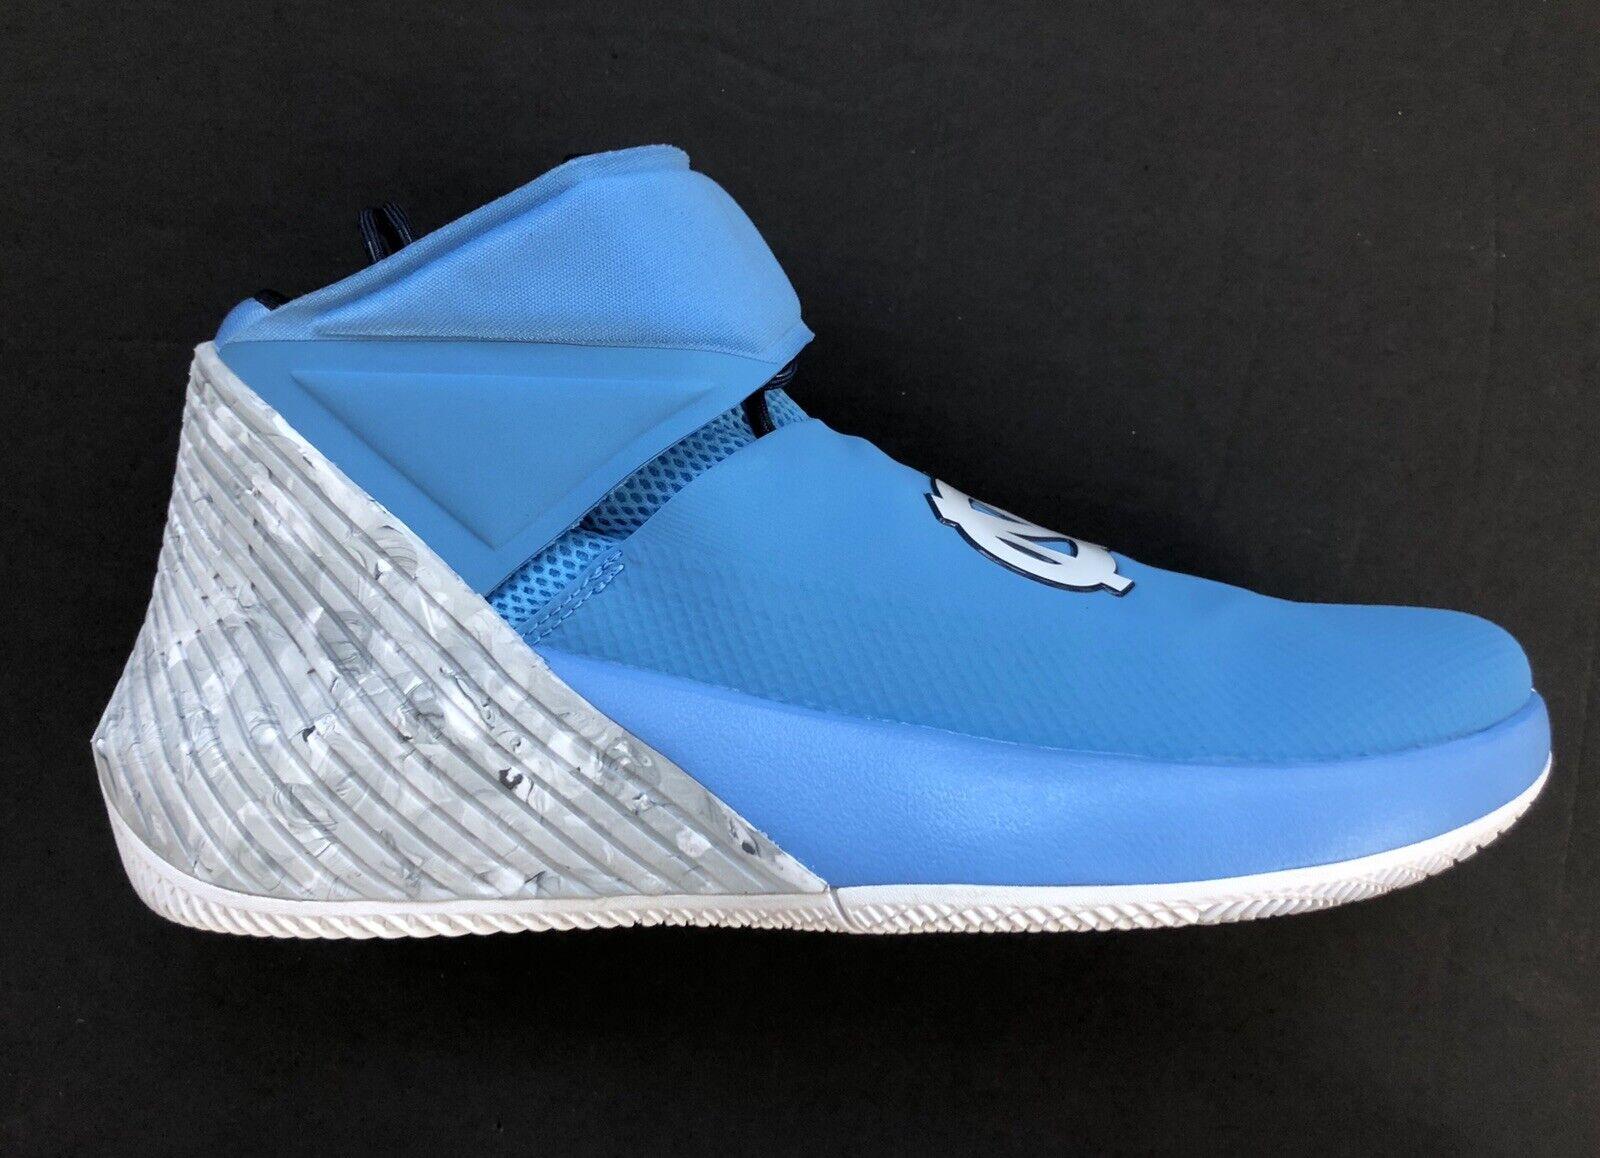 Nike Jordan Why Not Zero.1 North Carolina Tar Heels shoes AA2510-402 Size 10